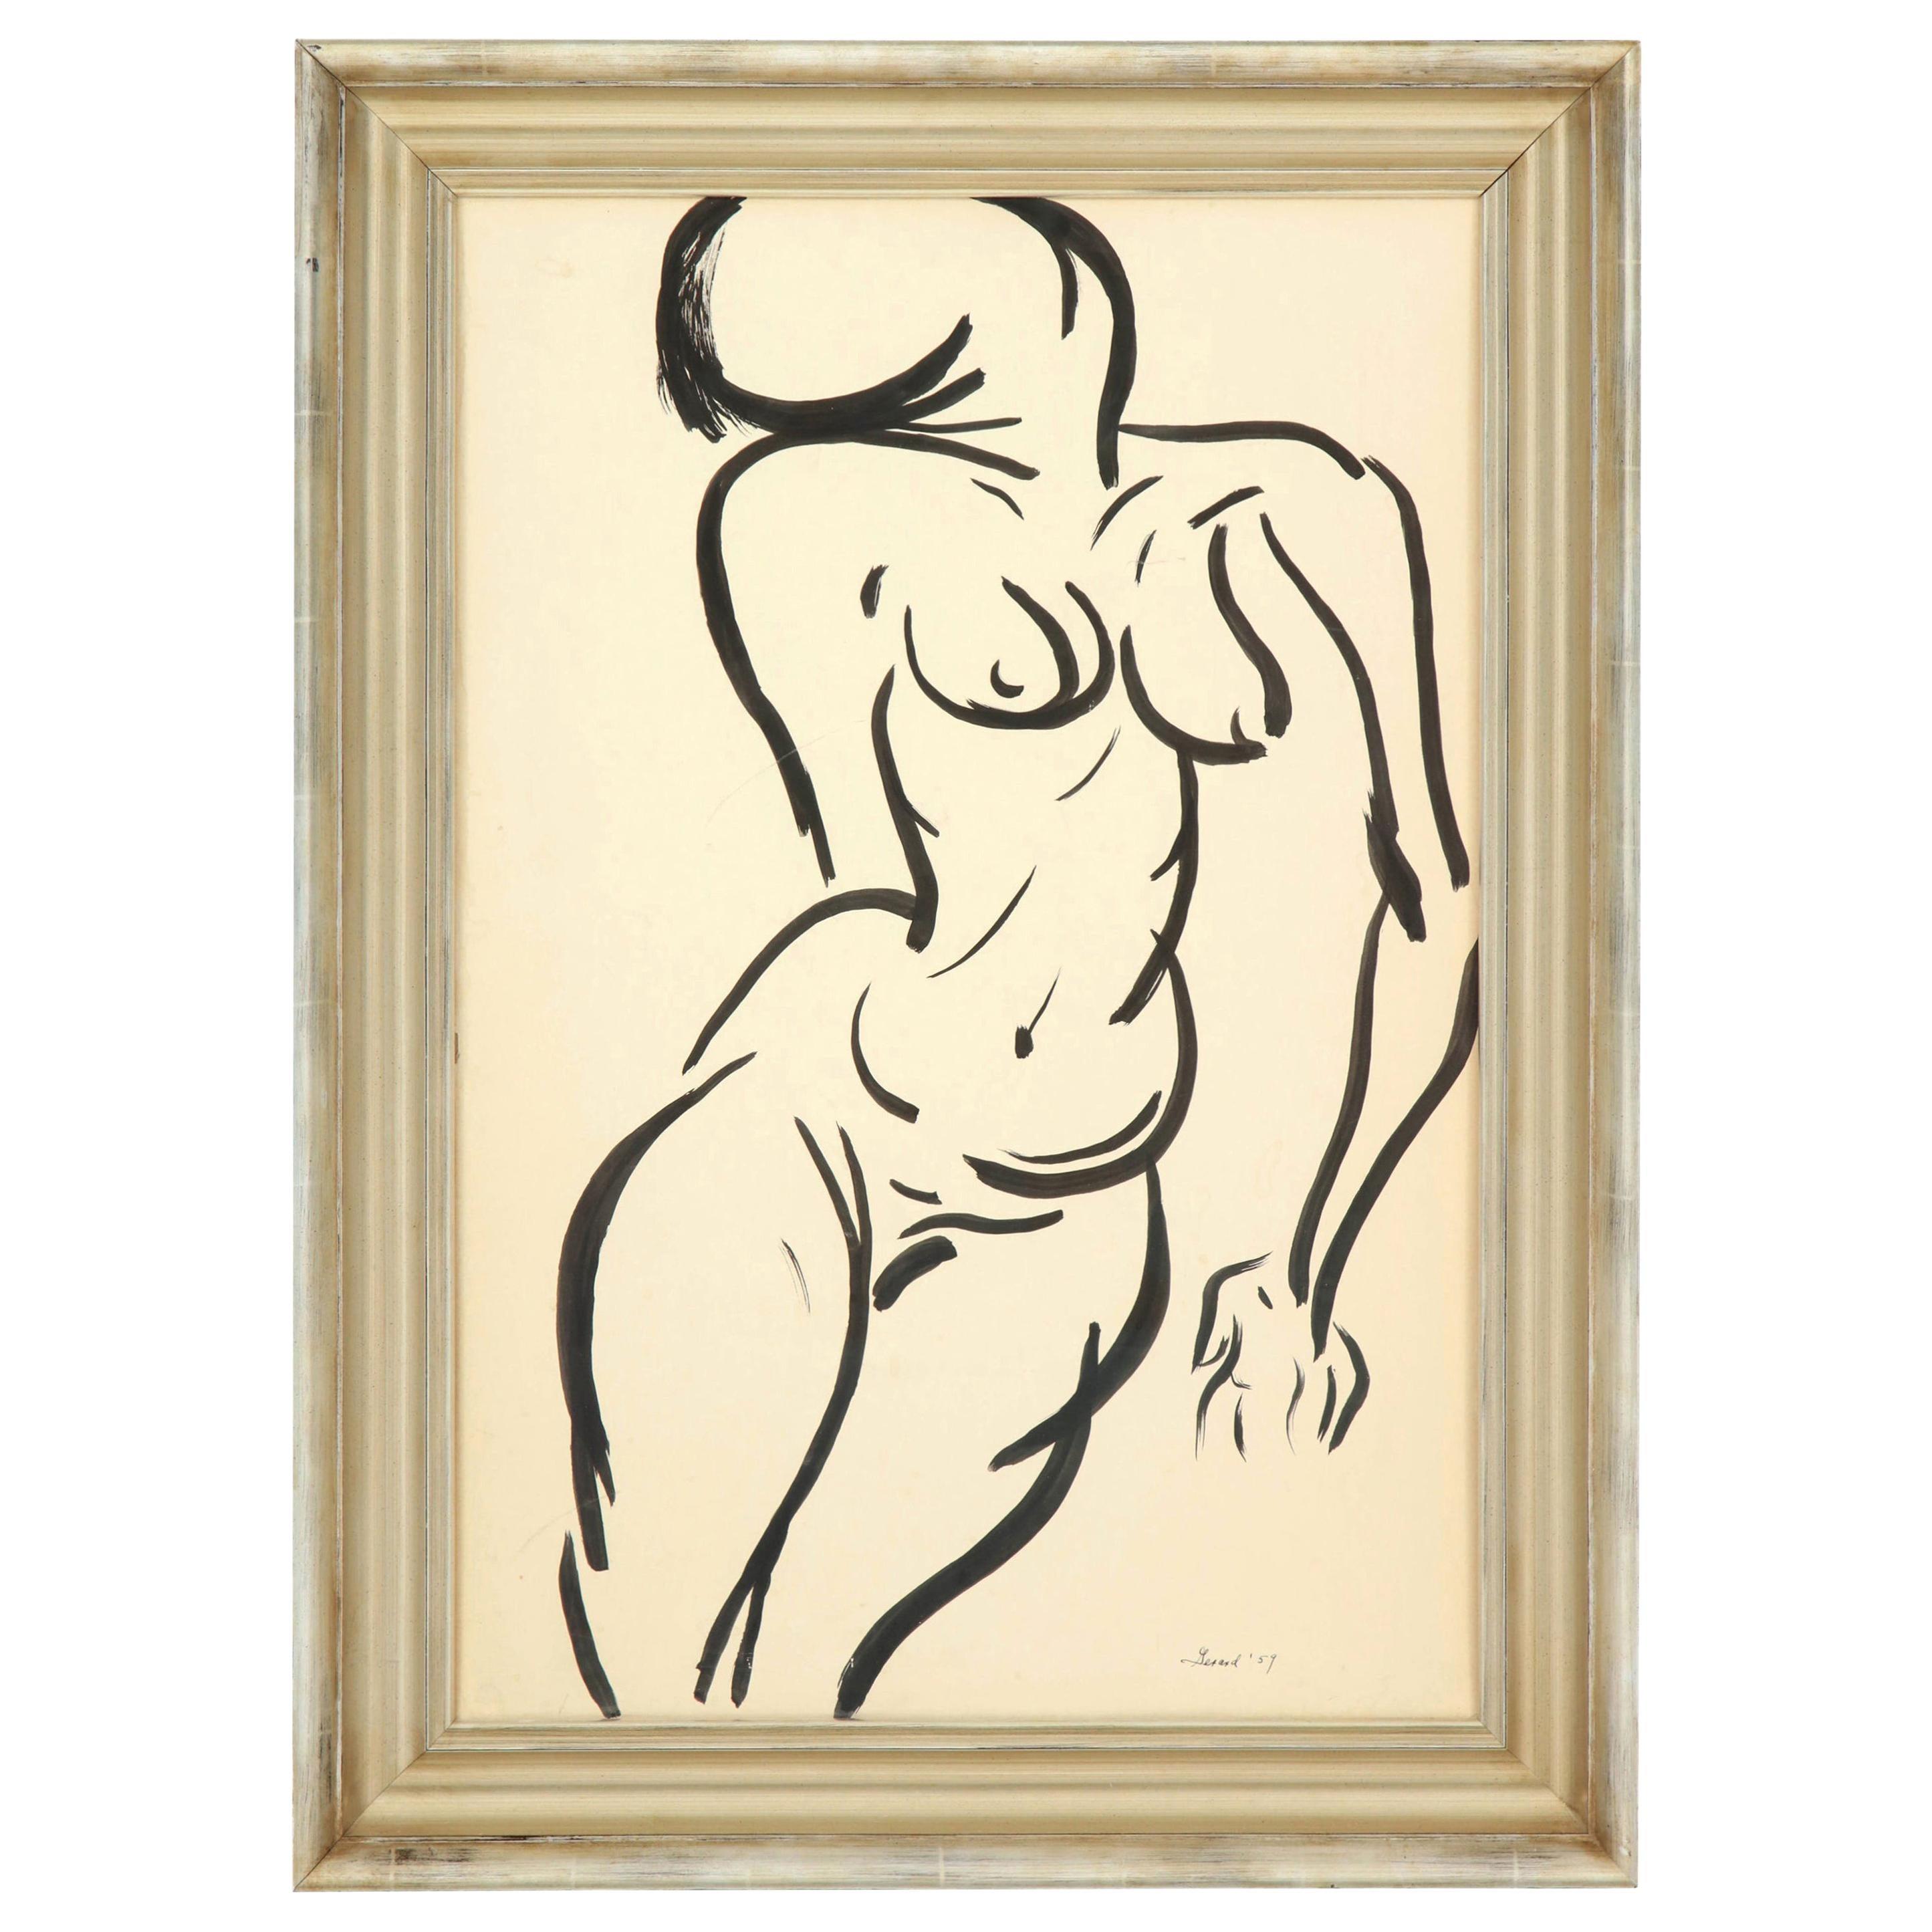 Painting, Nude, Mid-Century, Black and White, Modern Art, circa 1959